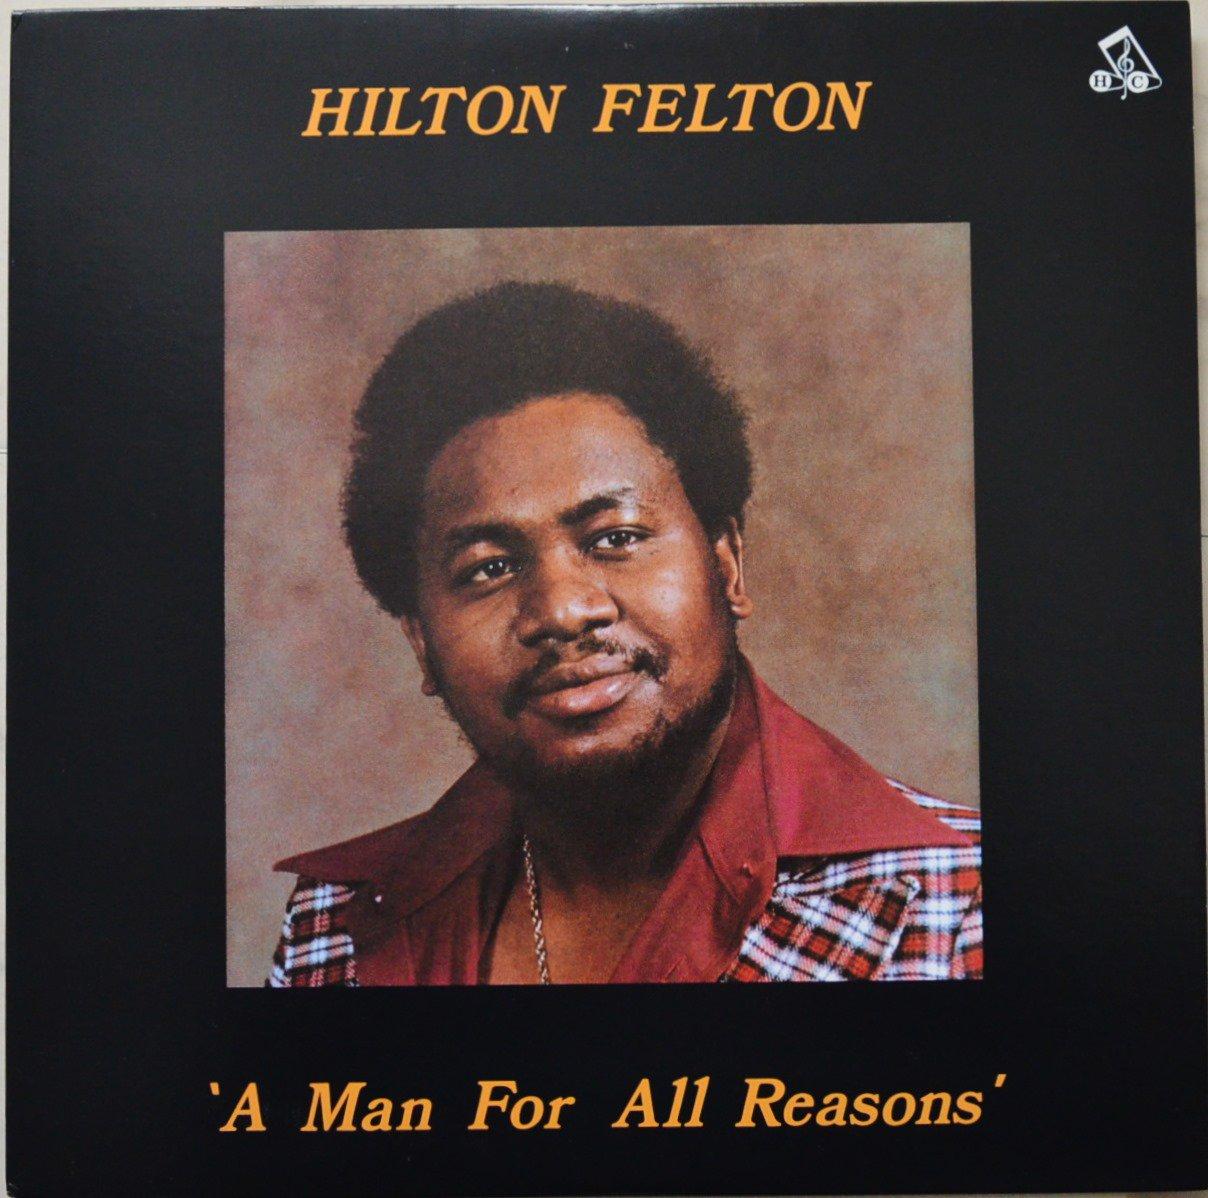 HILTON FELTON / A MAN FOR ALL REASONS (LP)